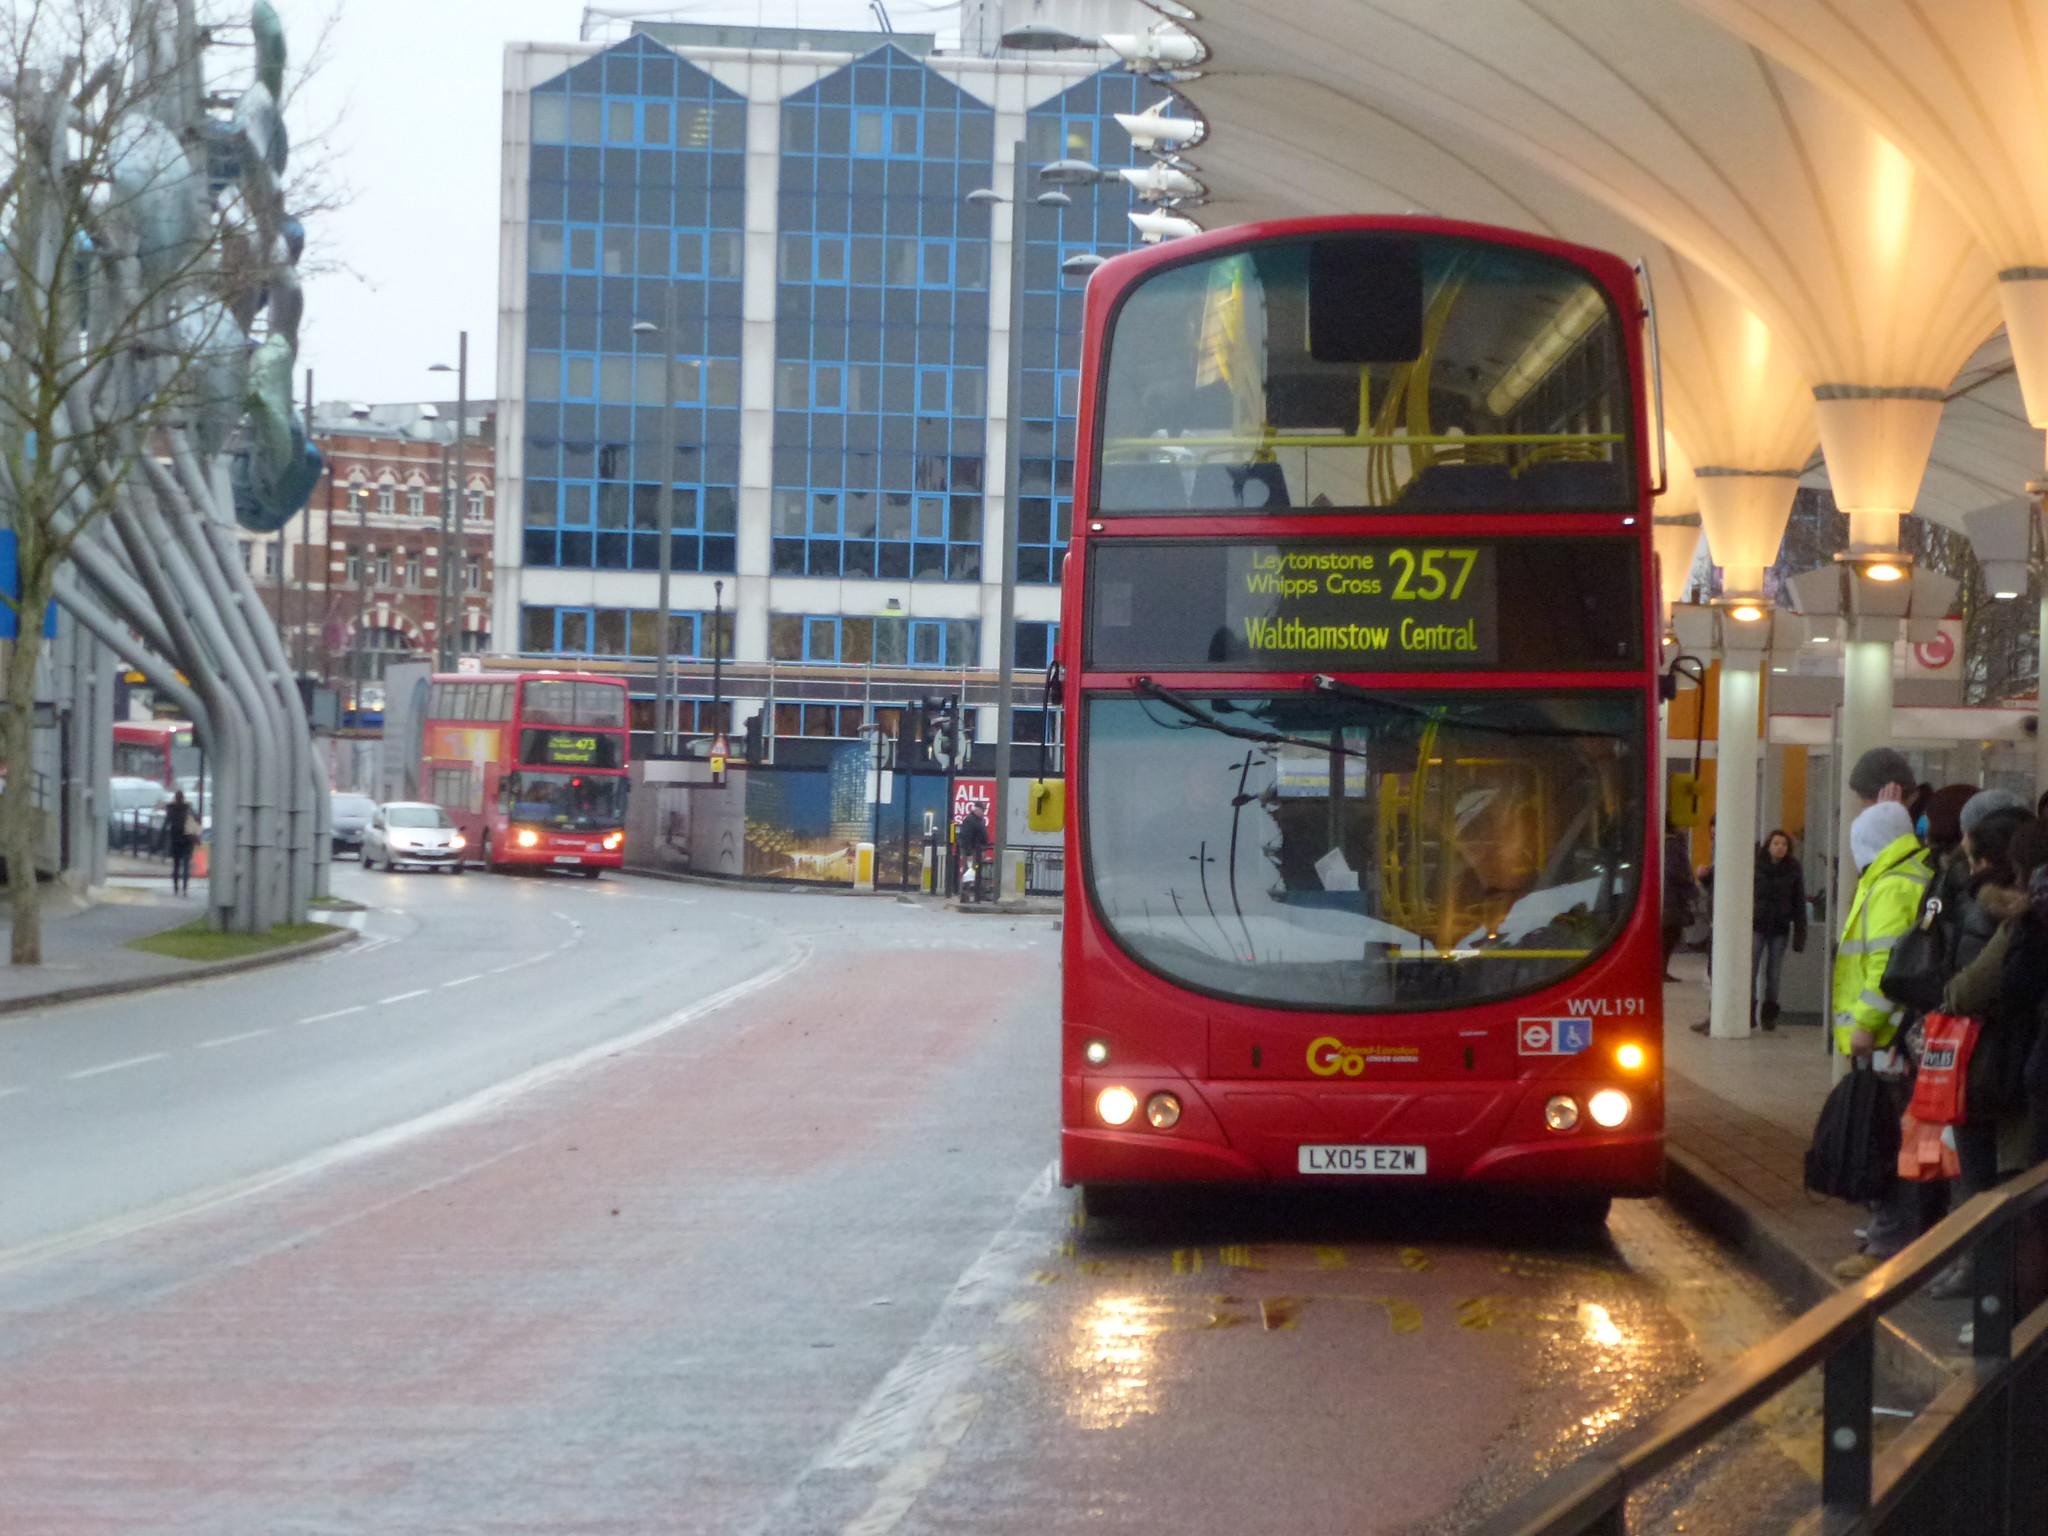 #AYearOfBuses 257: Stratford – Walthamstow Central